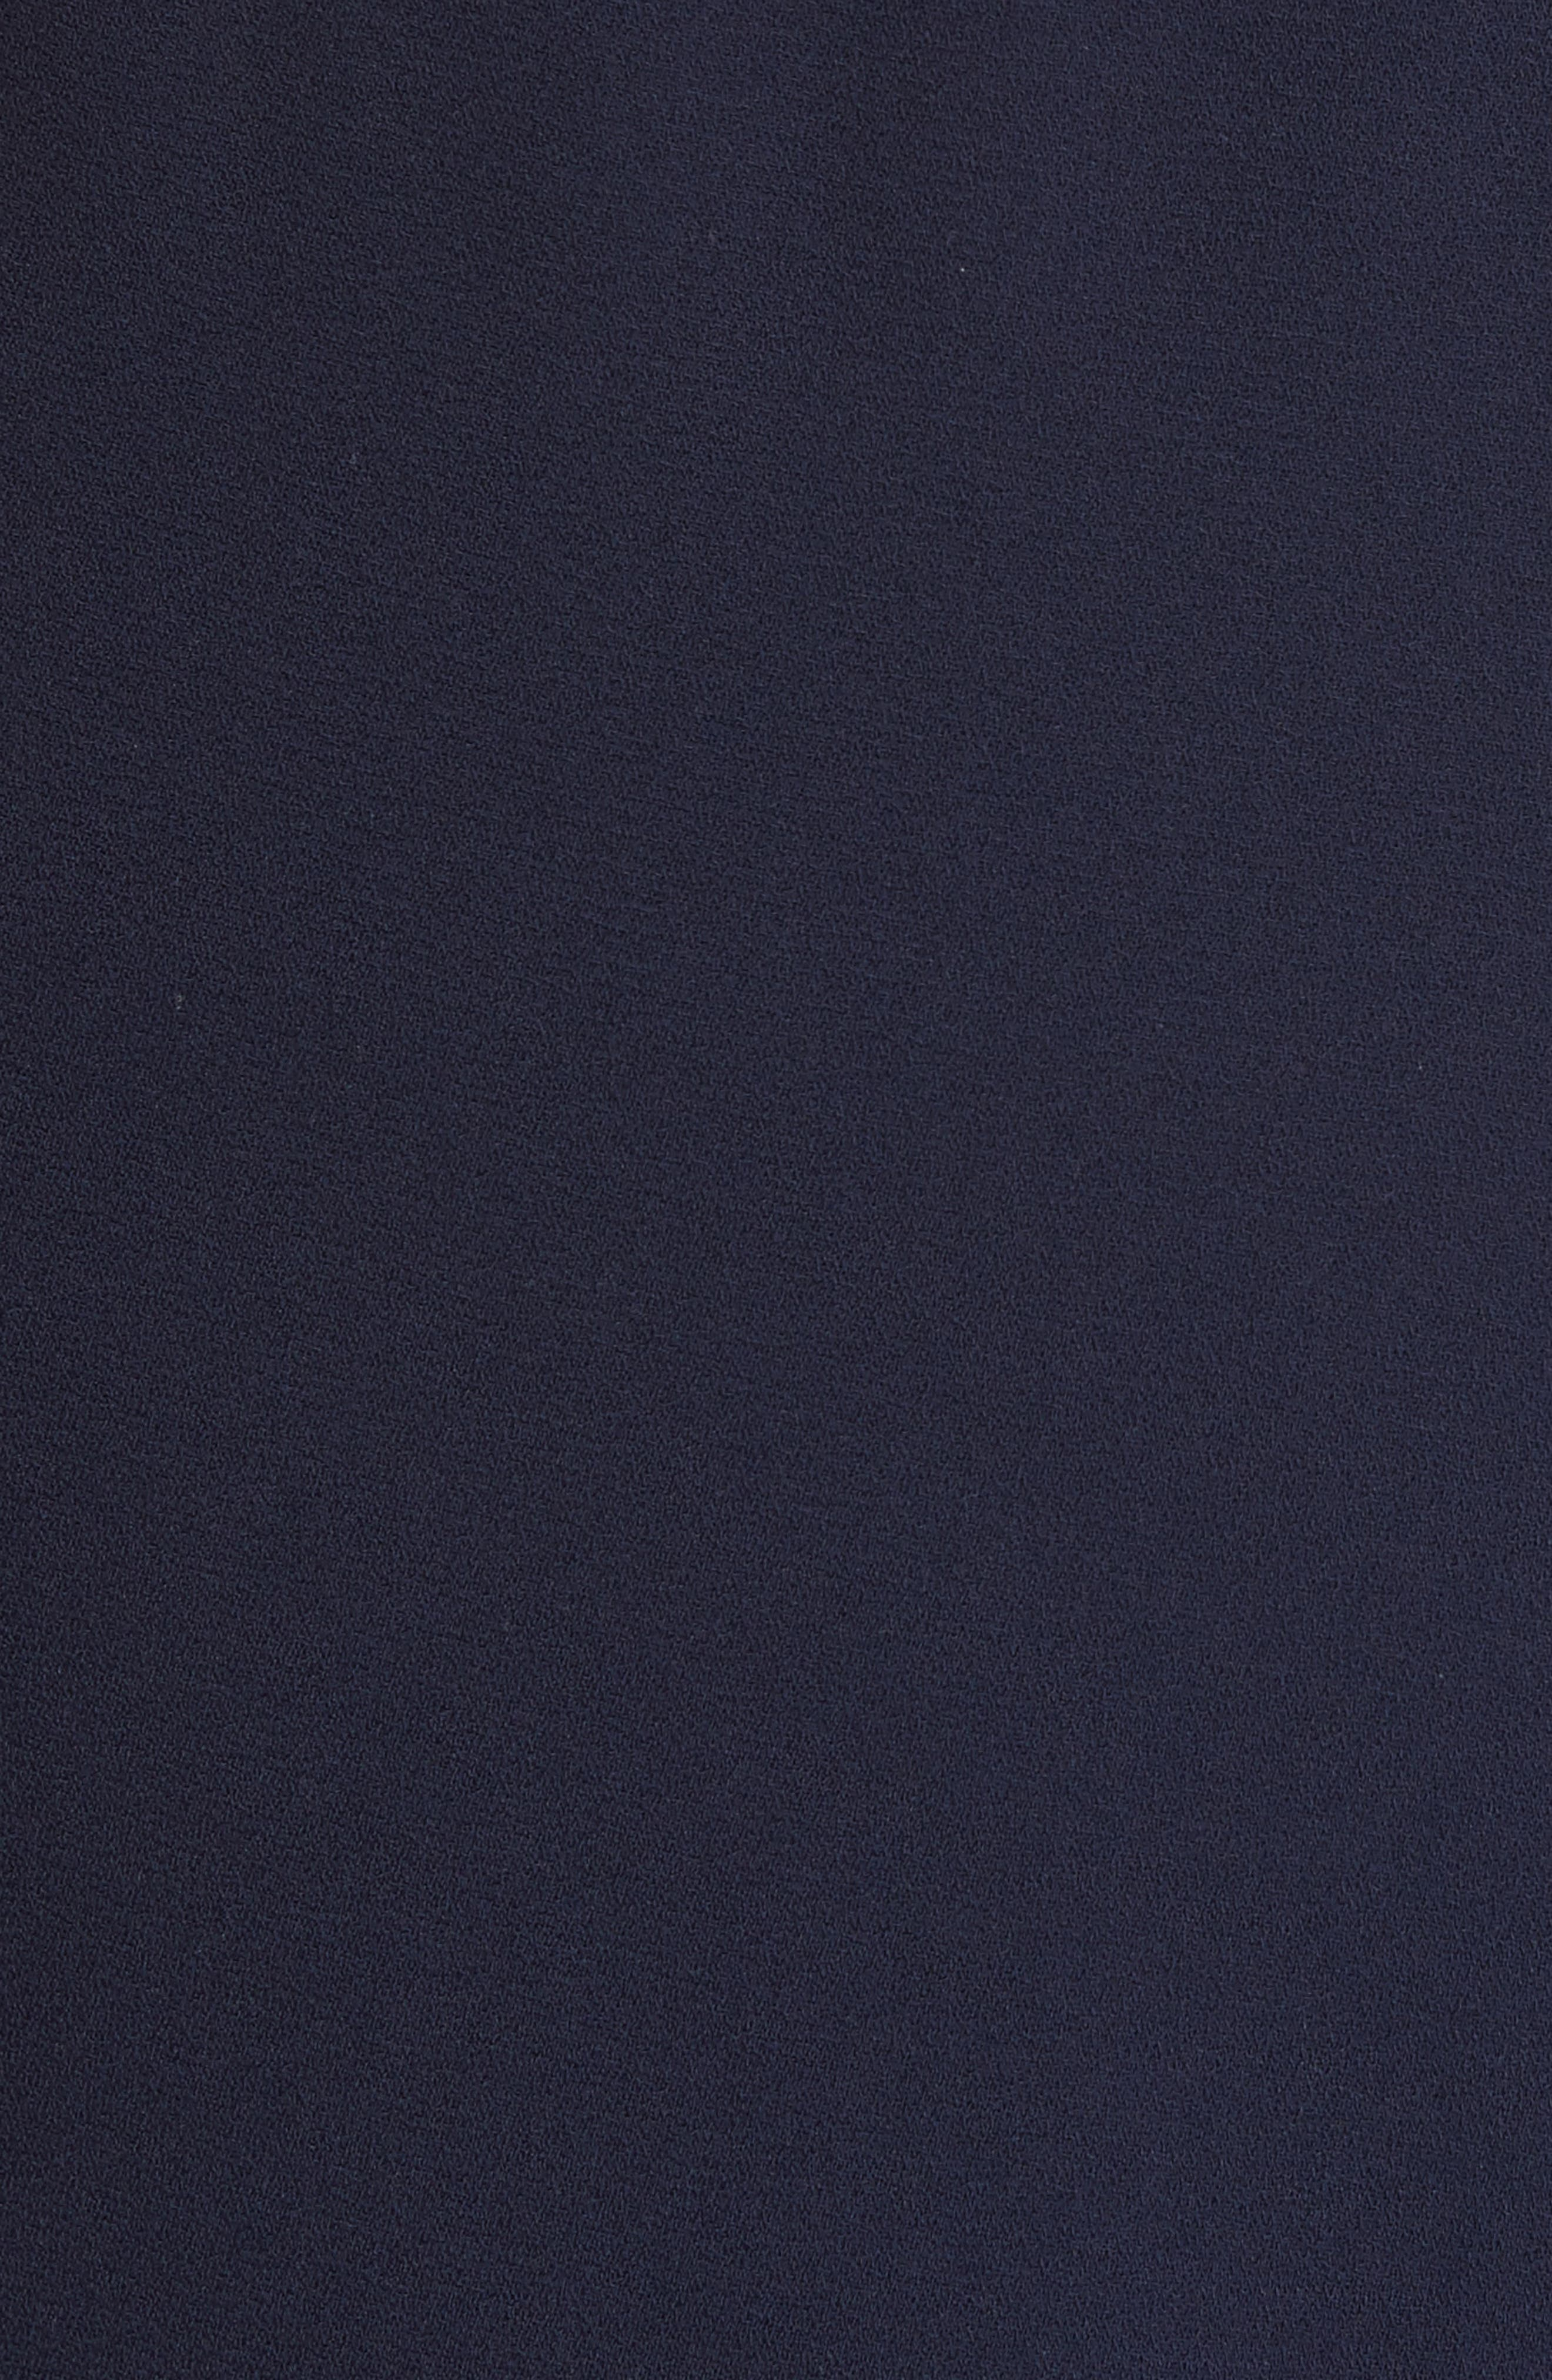 Shavon High Waist Side Slit Flare Pants,                             Alternate thumbnail 5, color,                             400